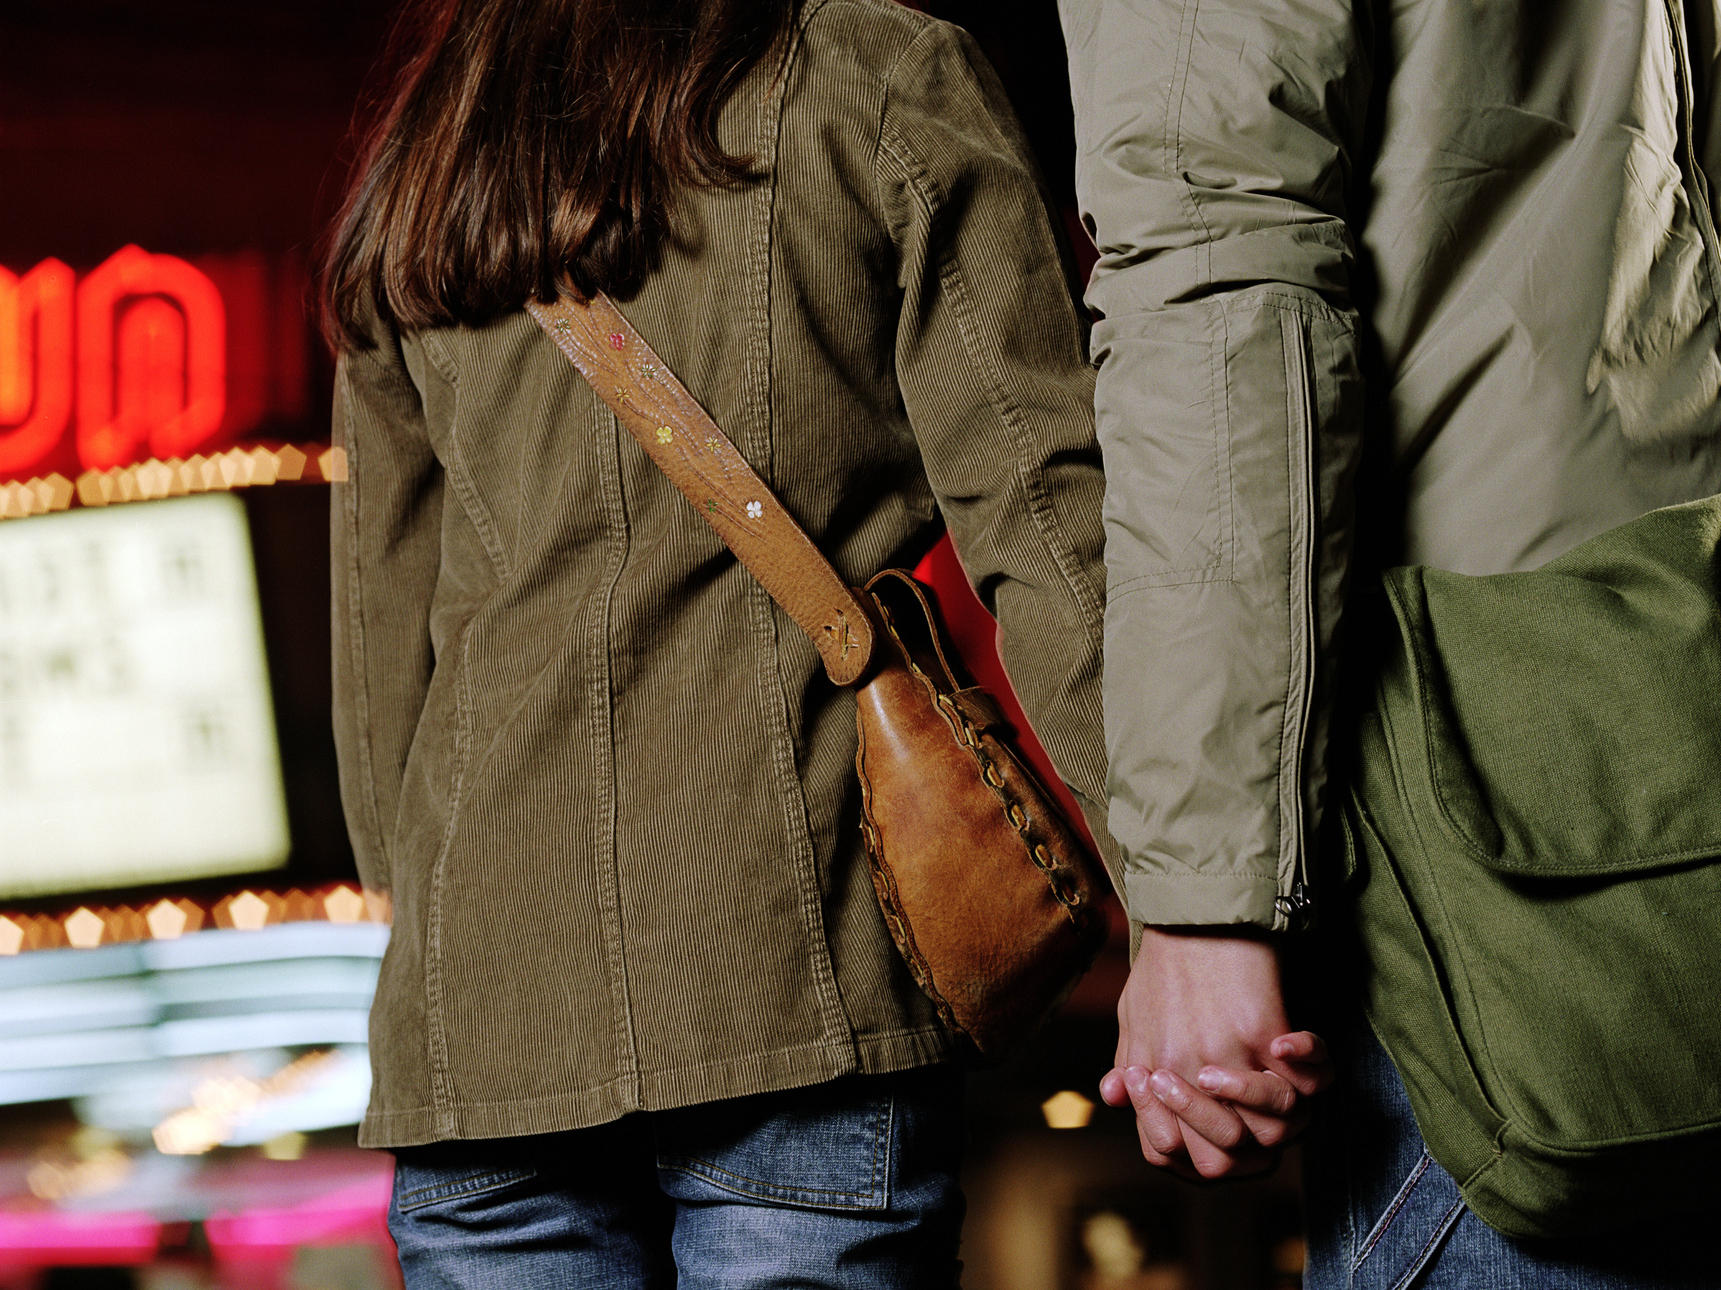 Global teen dating